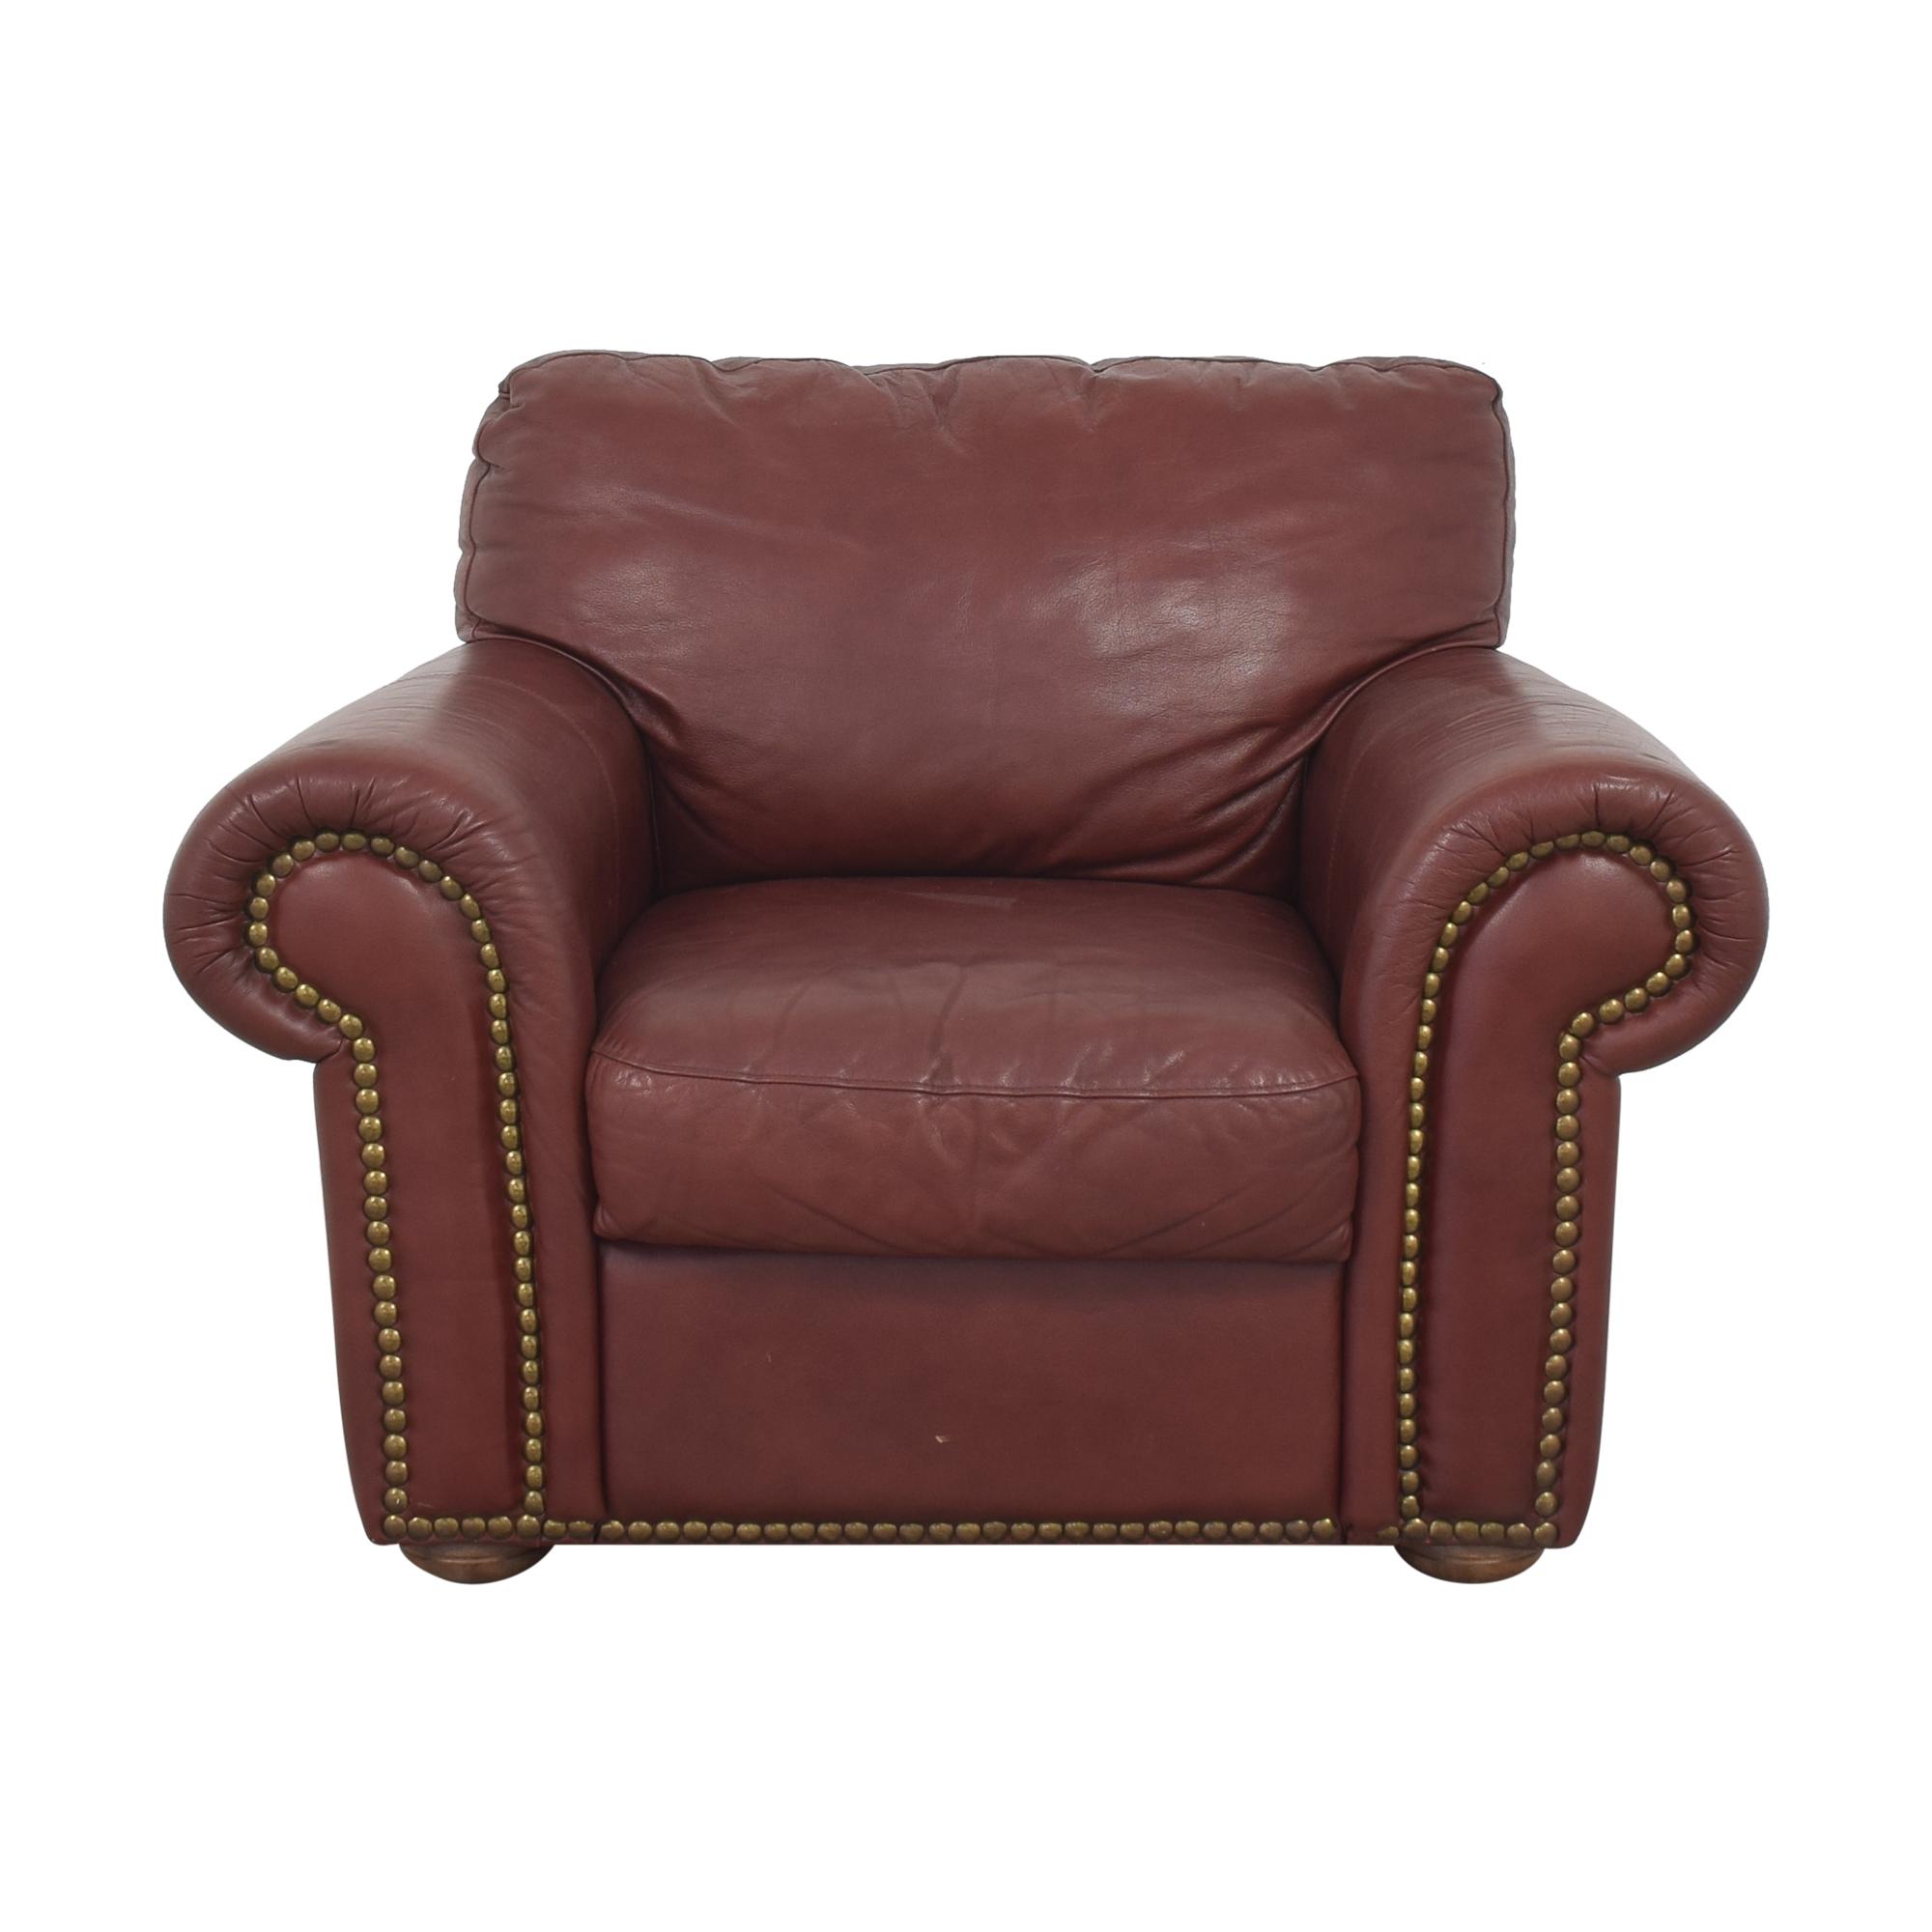 buy Macy's Nailhead Trim Armchair Macy's Chairs